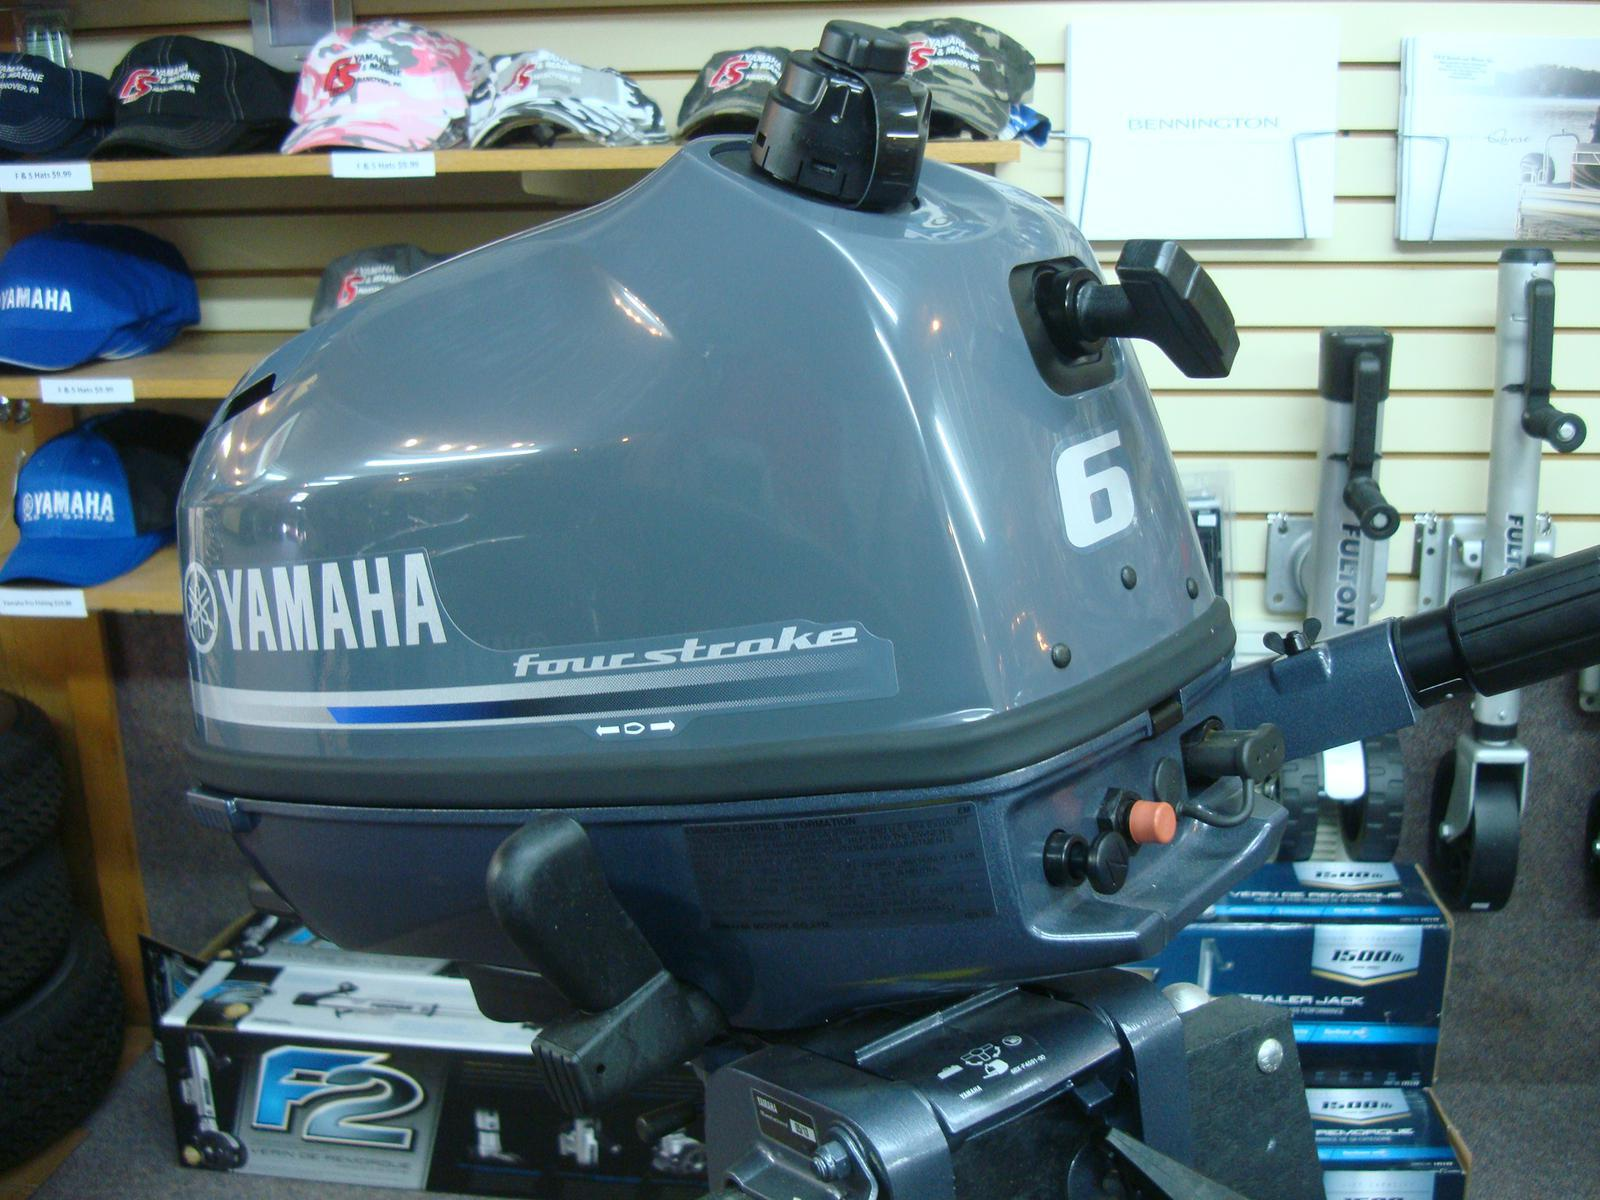 2019 Yamaha F6 SMHA